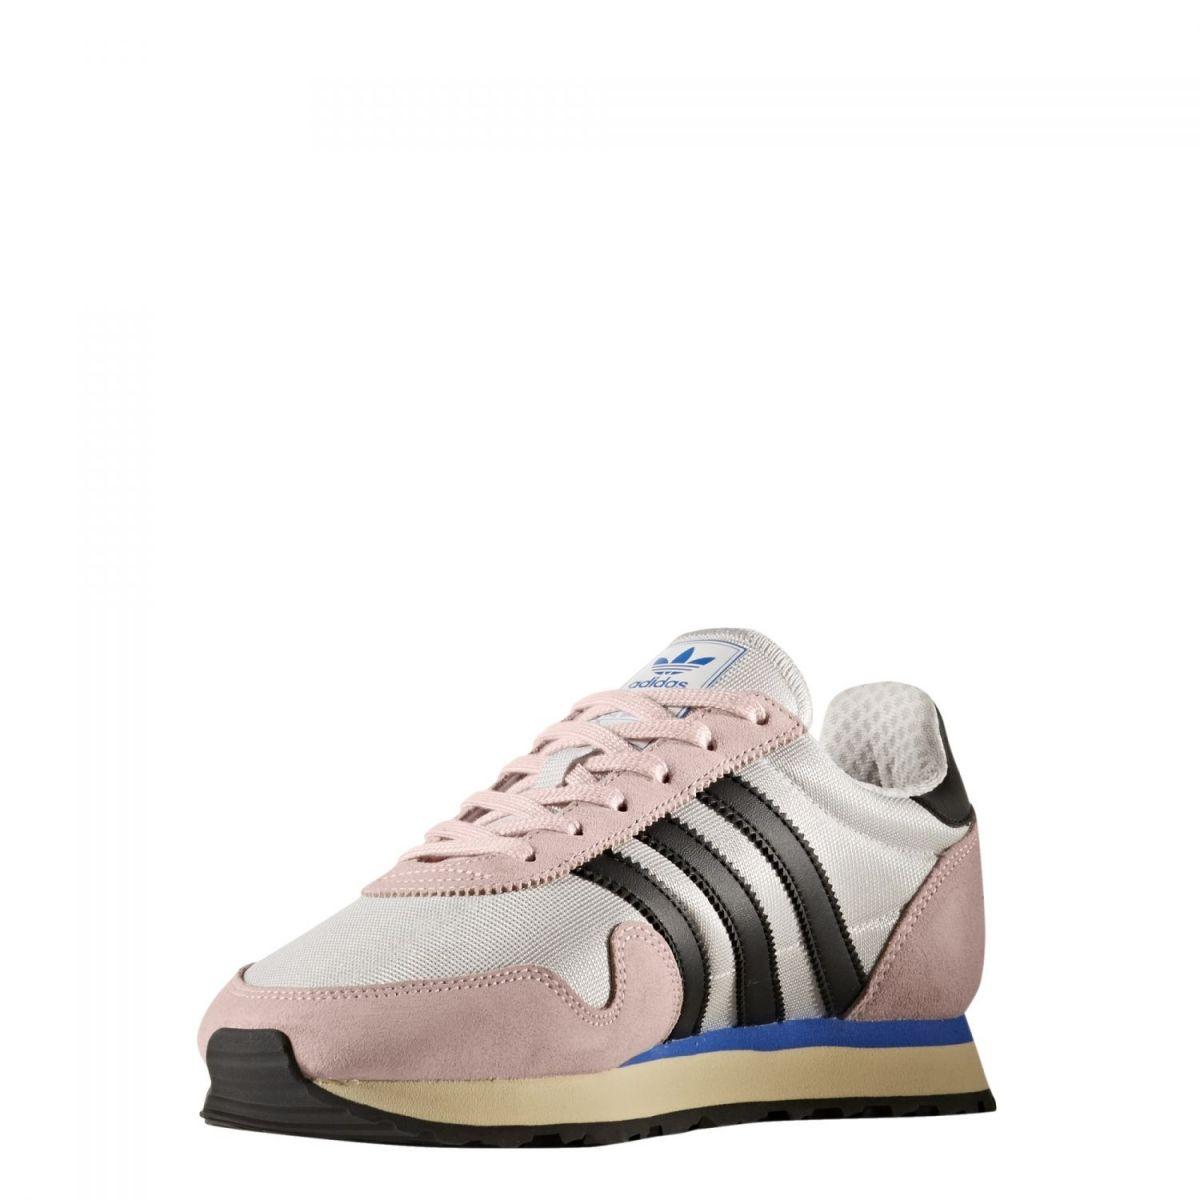 9e6b90630a5f3d damen adidas grau adidas adidas sneaker sneaker sneaker grau damen nqRFIxT